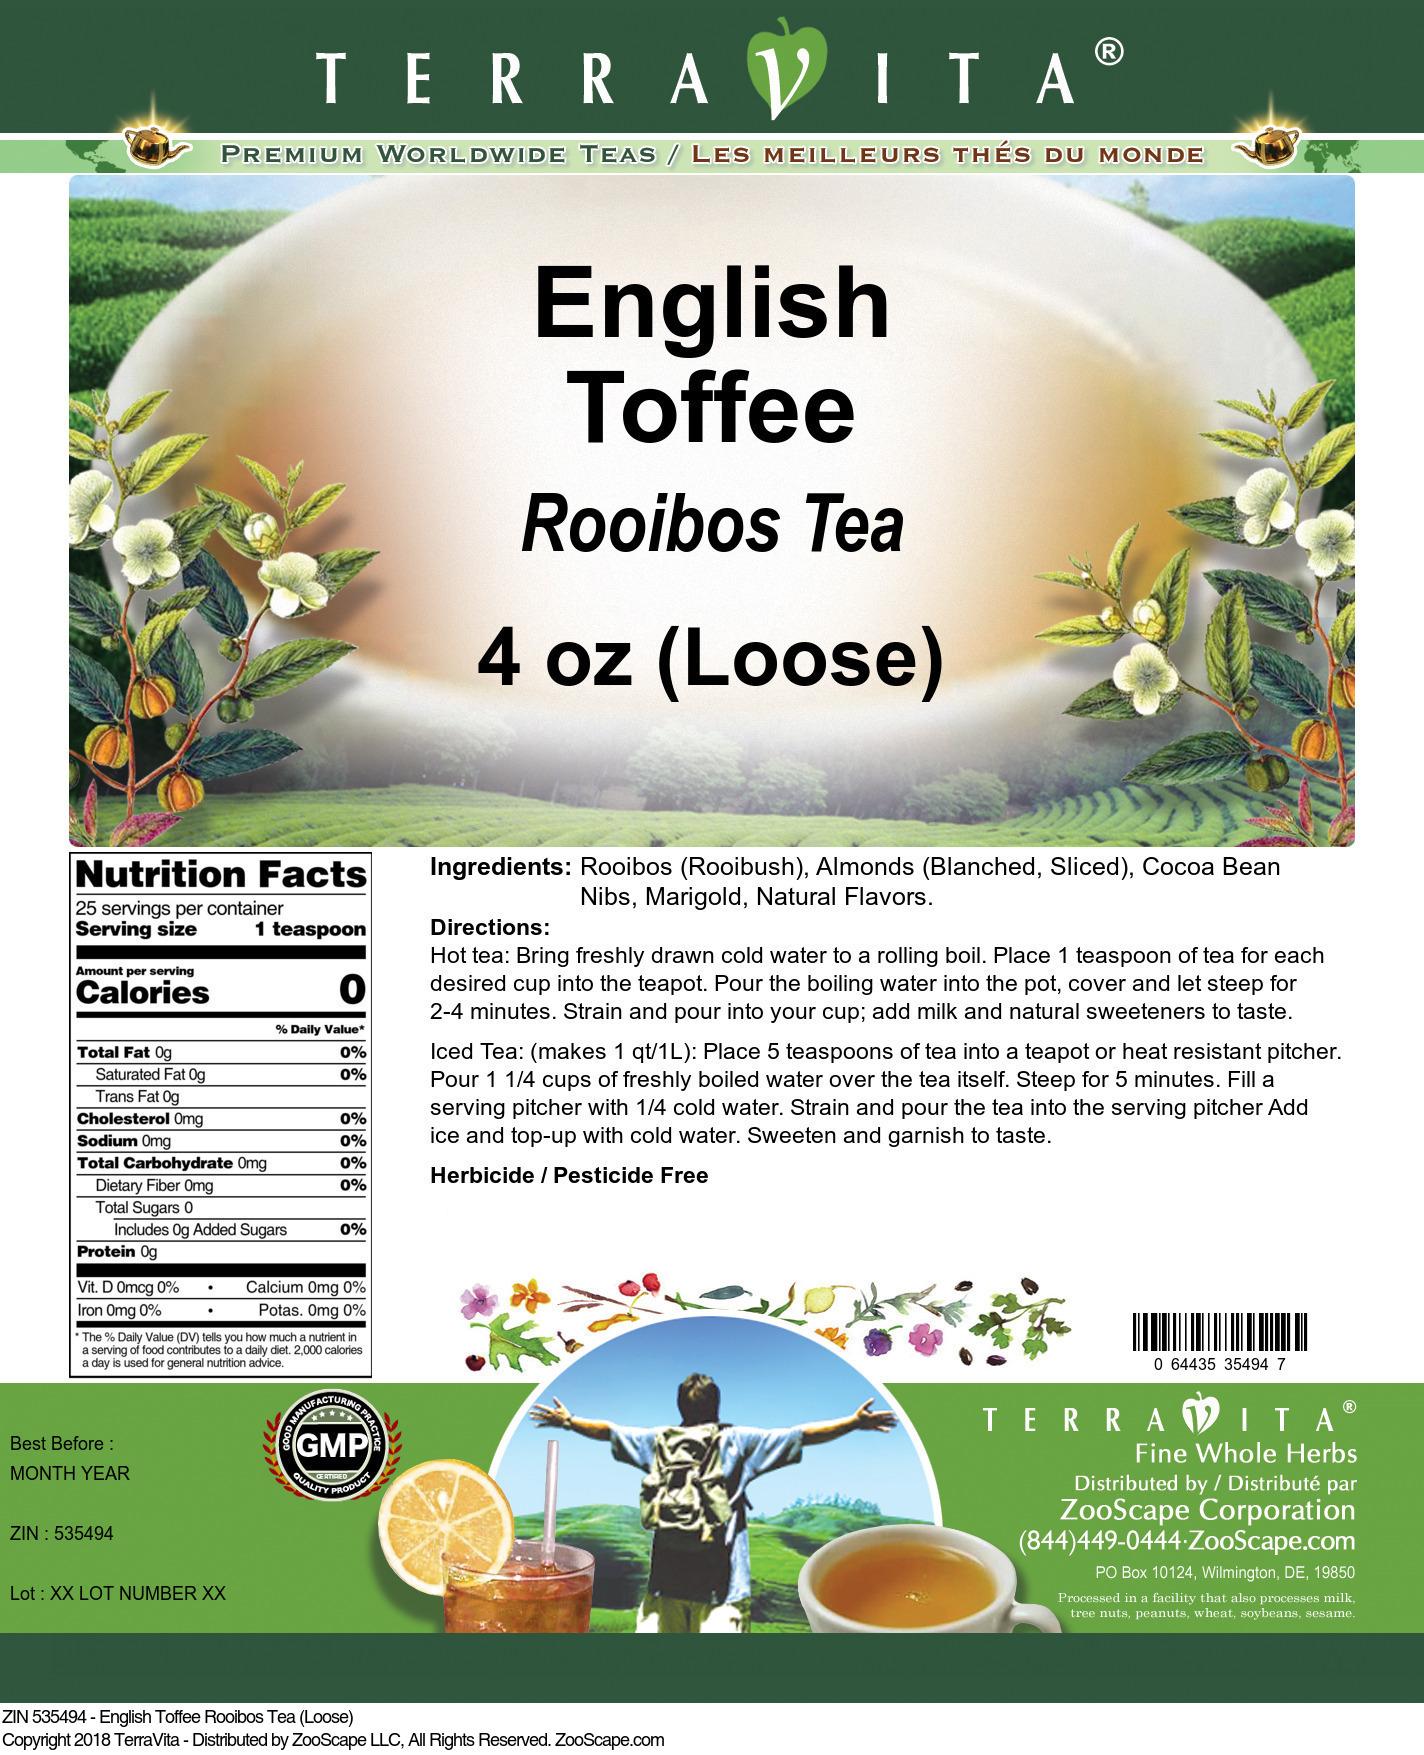 English Toffee Rooibos Tea (Loose)